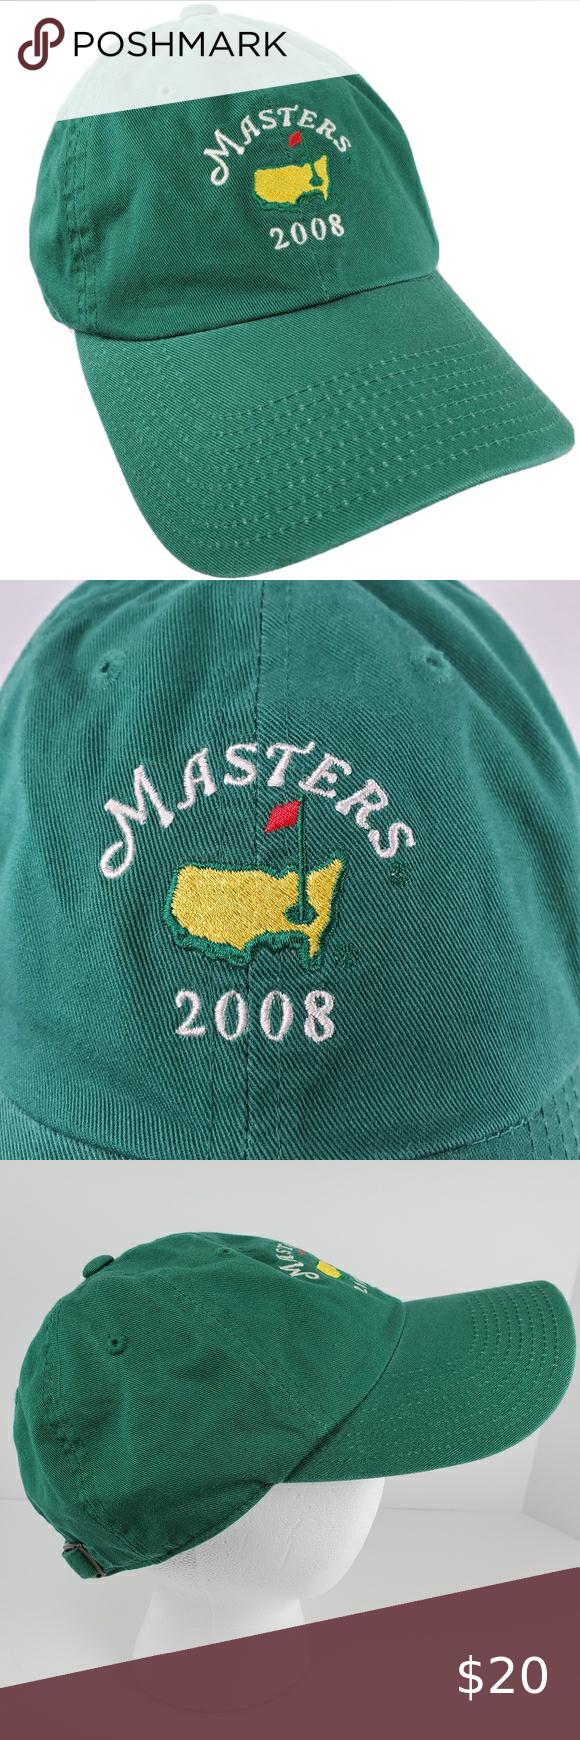 Pga Masters Golf Hat Adjustable Cap Green 2008 Golf Hats Pga Masters Masters Golf